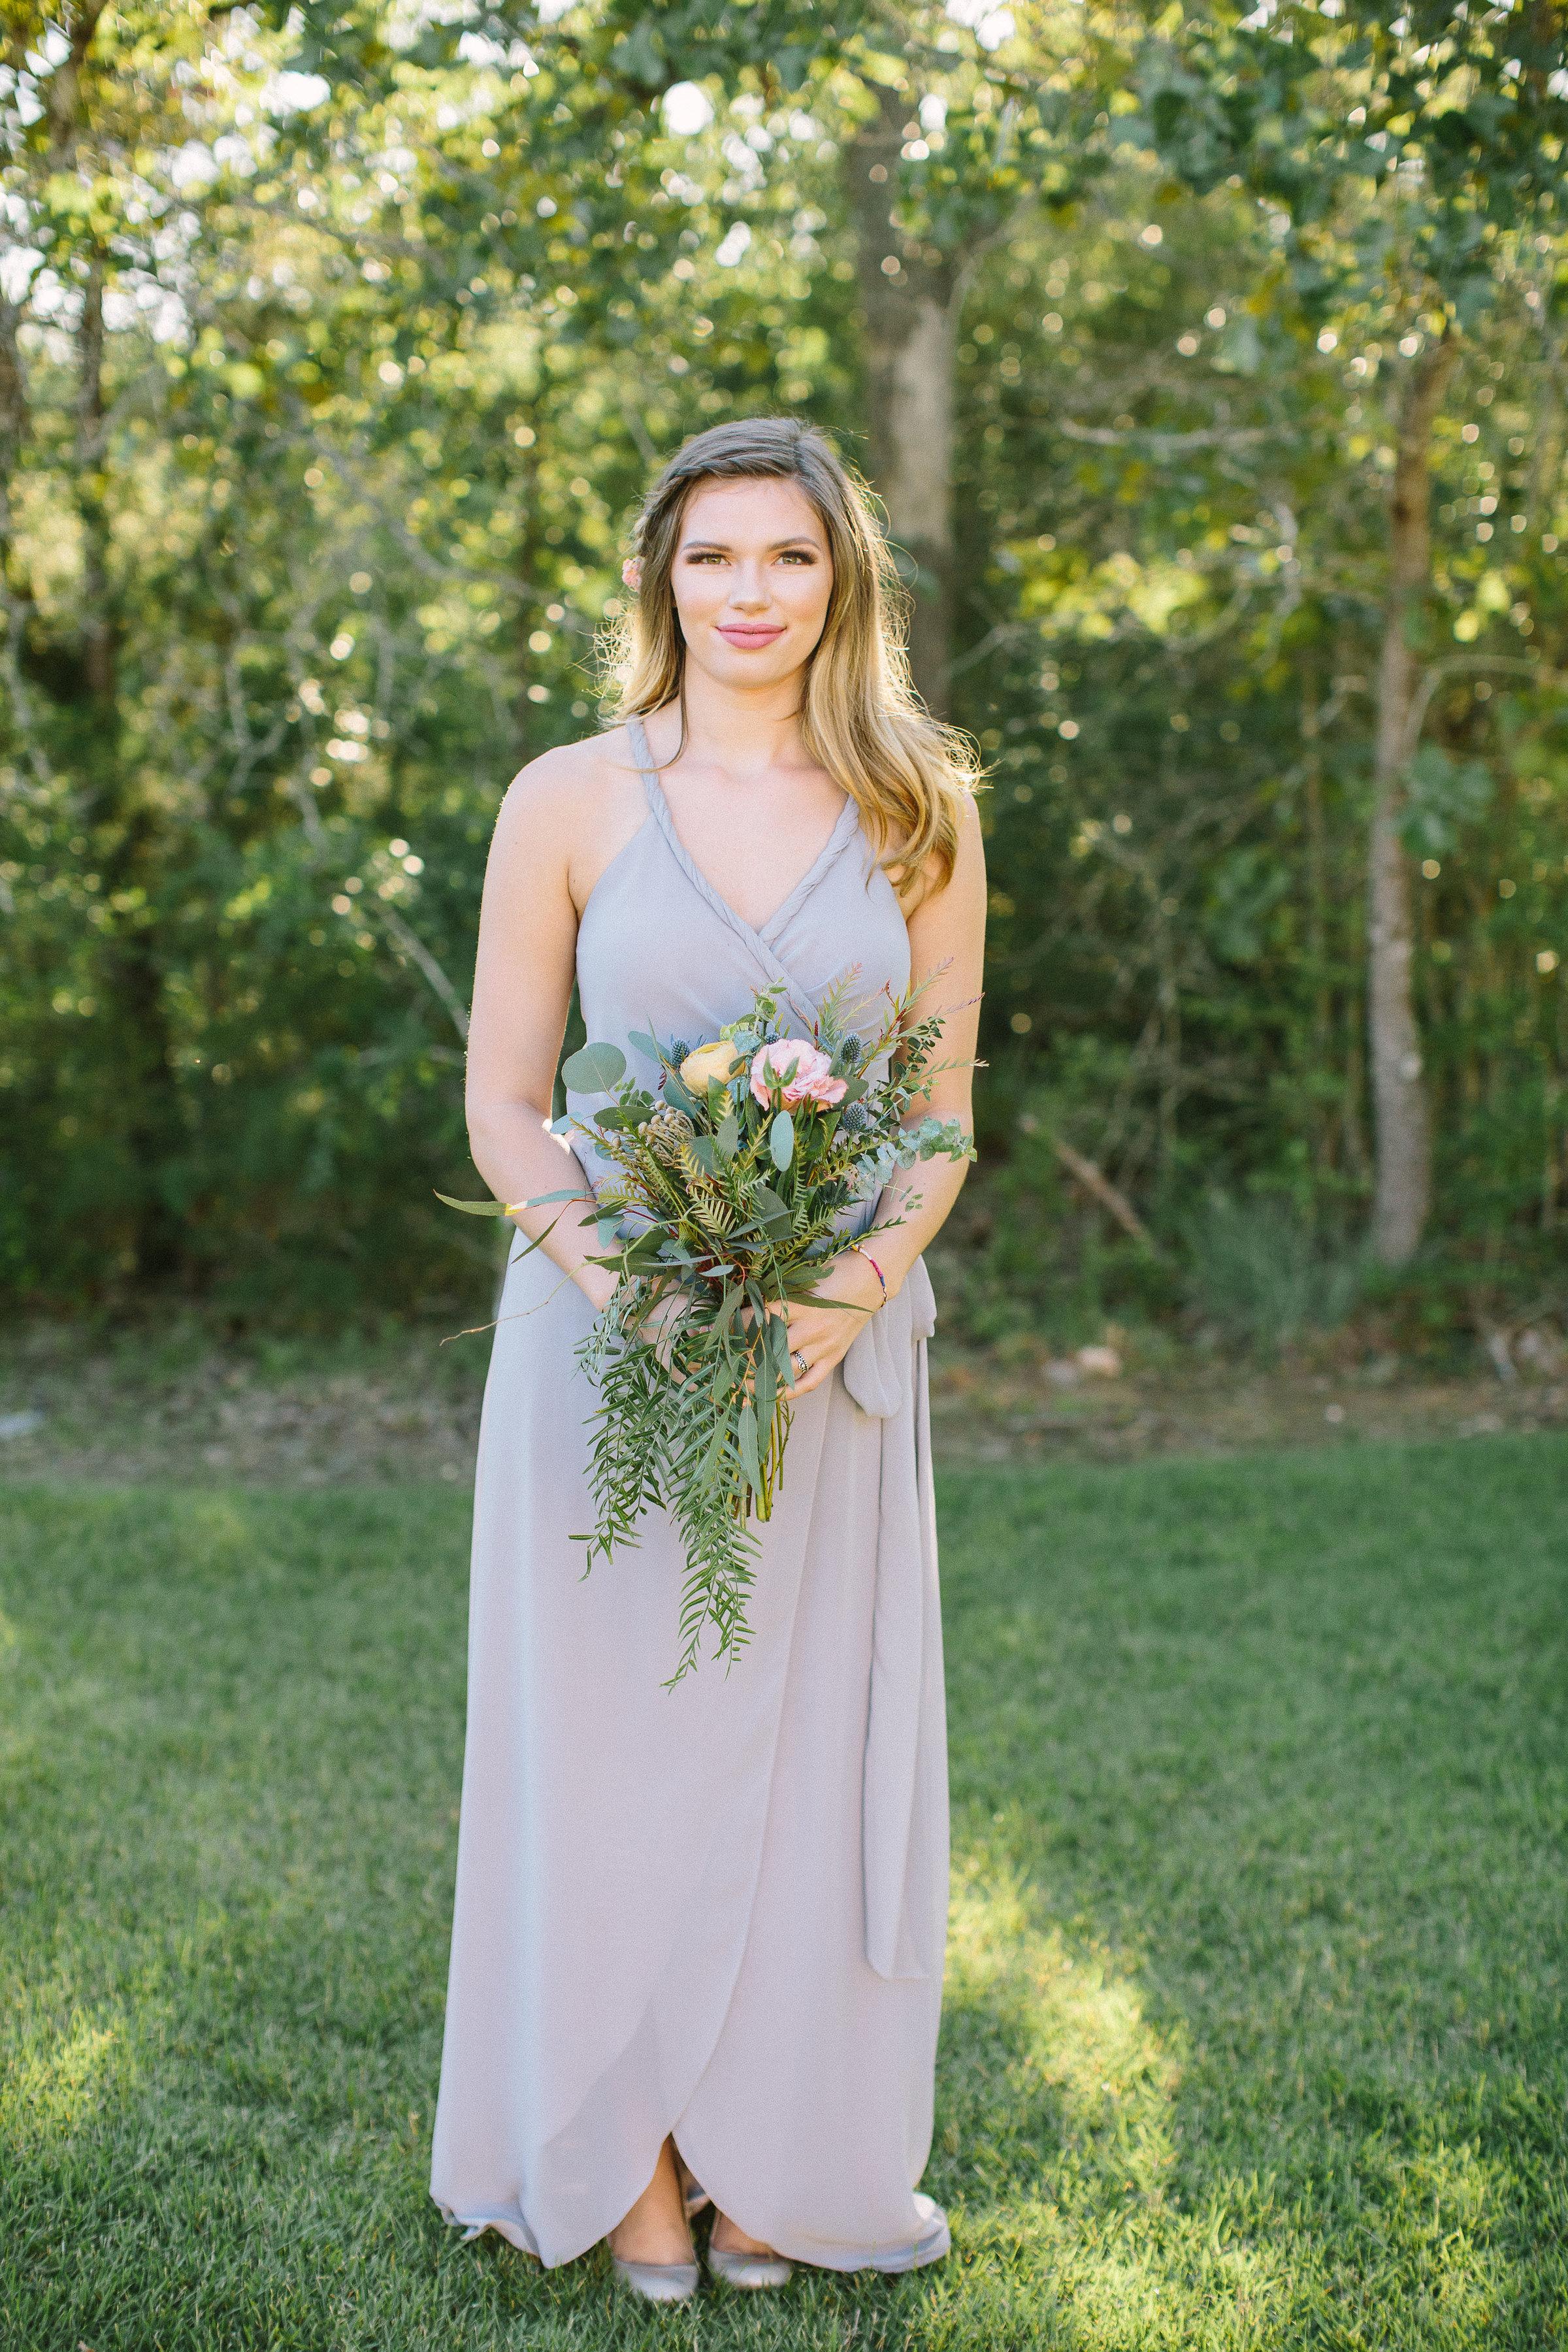 Ellen-Ashton-Photography-Peach-Creek-Ranch-Weddings-Wed-and-Prosper180